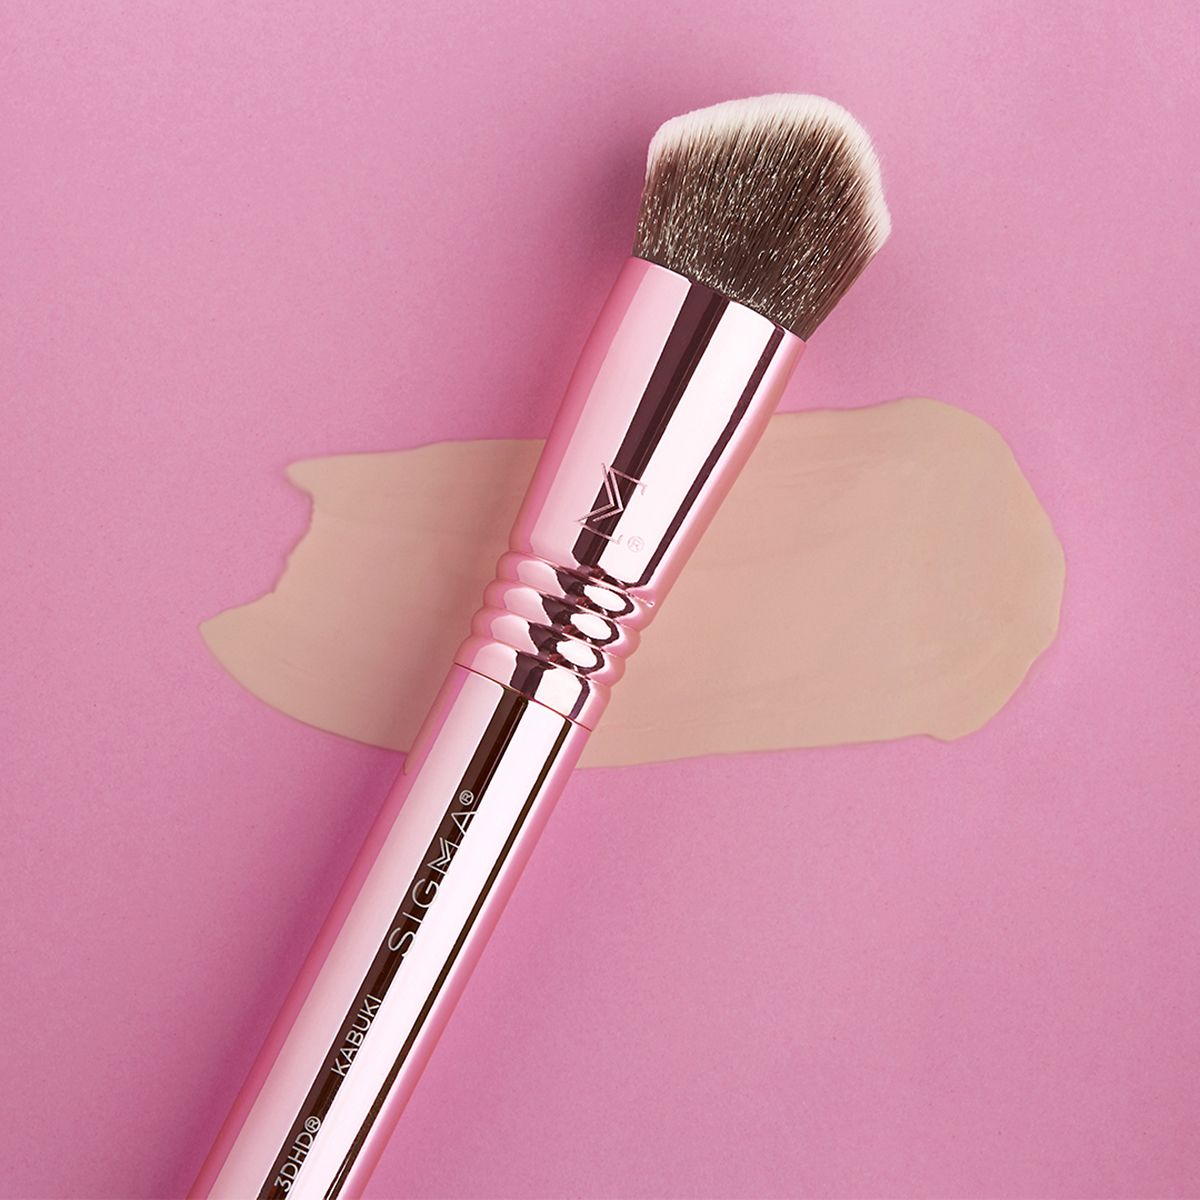 3DHD® Perfect Complexion Set Perfect complexion, Makeup